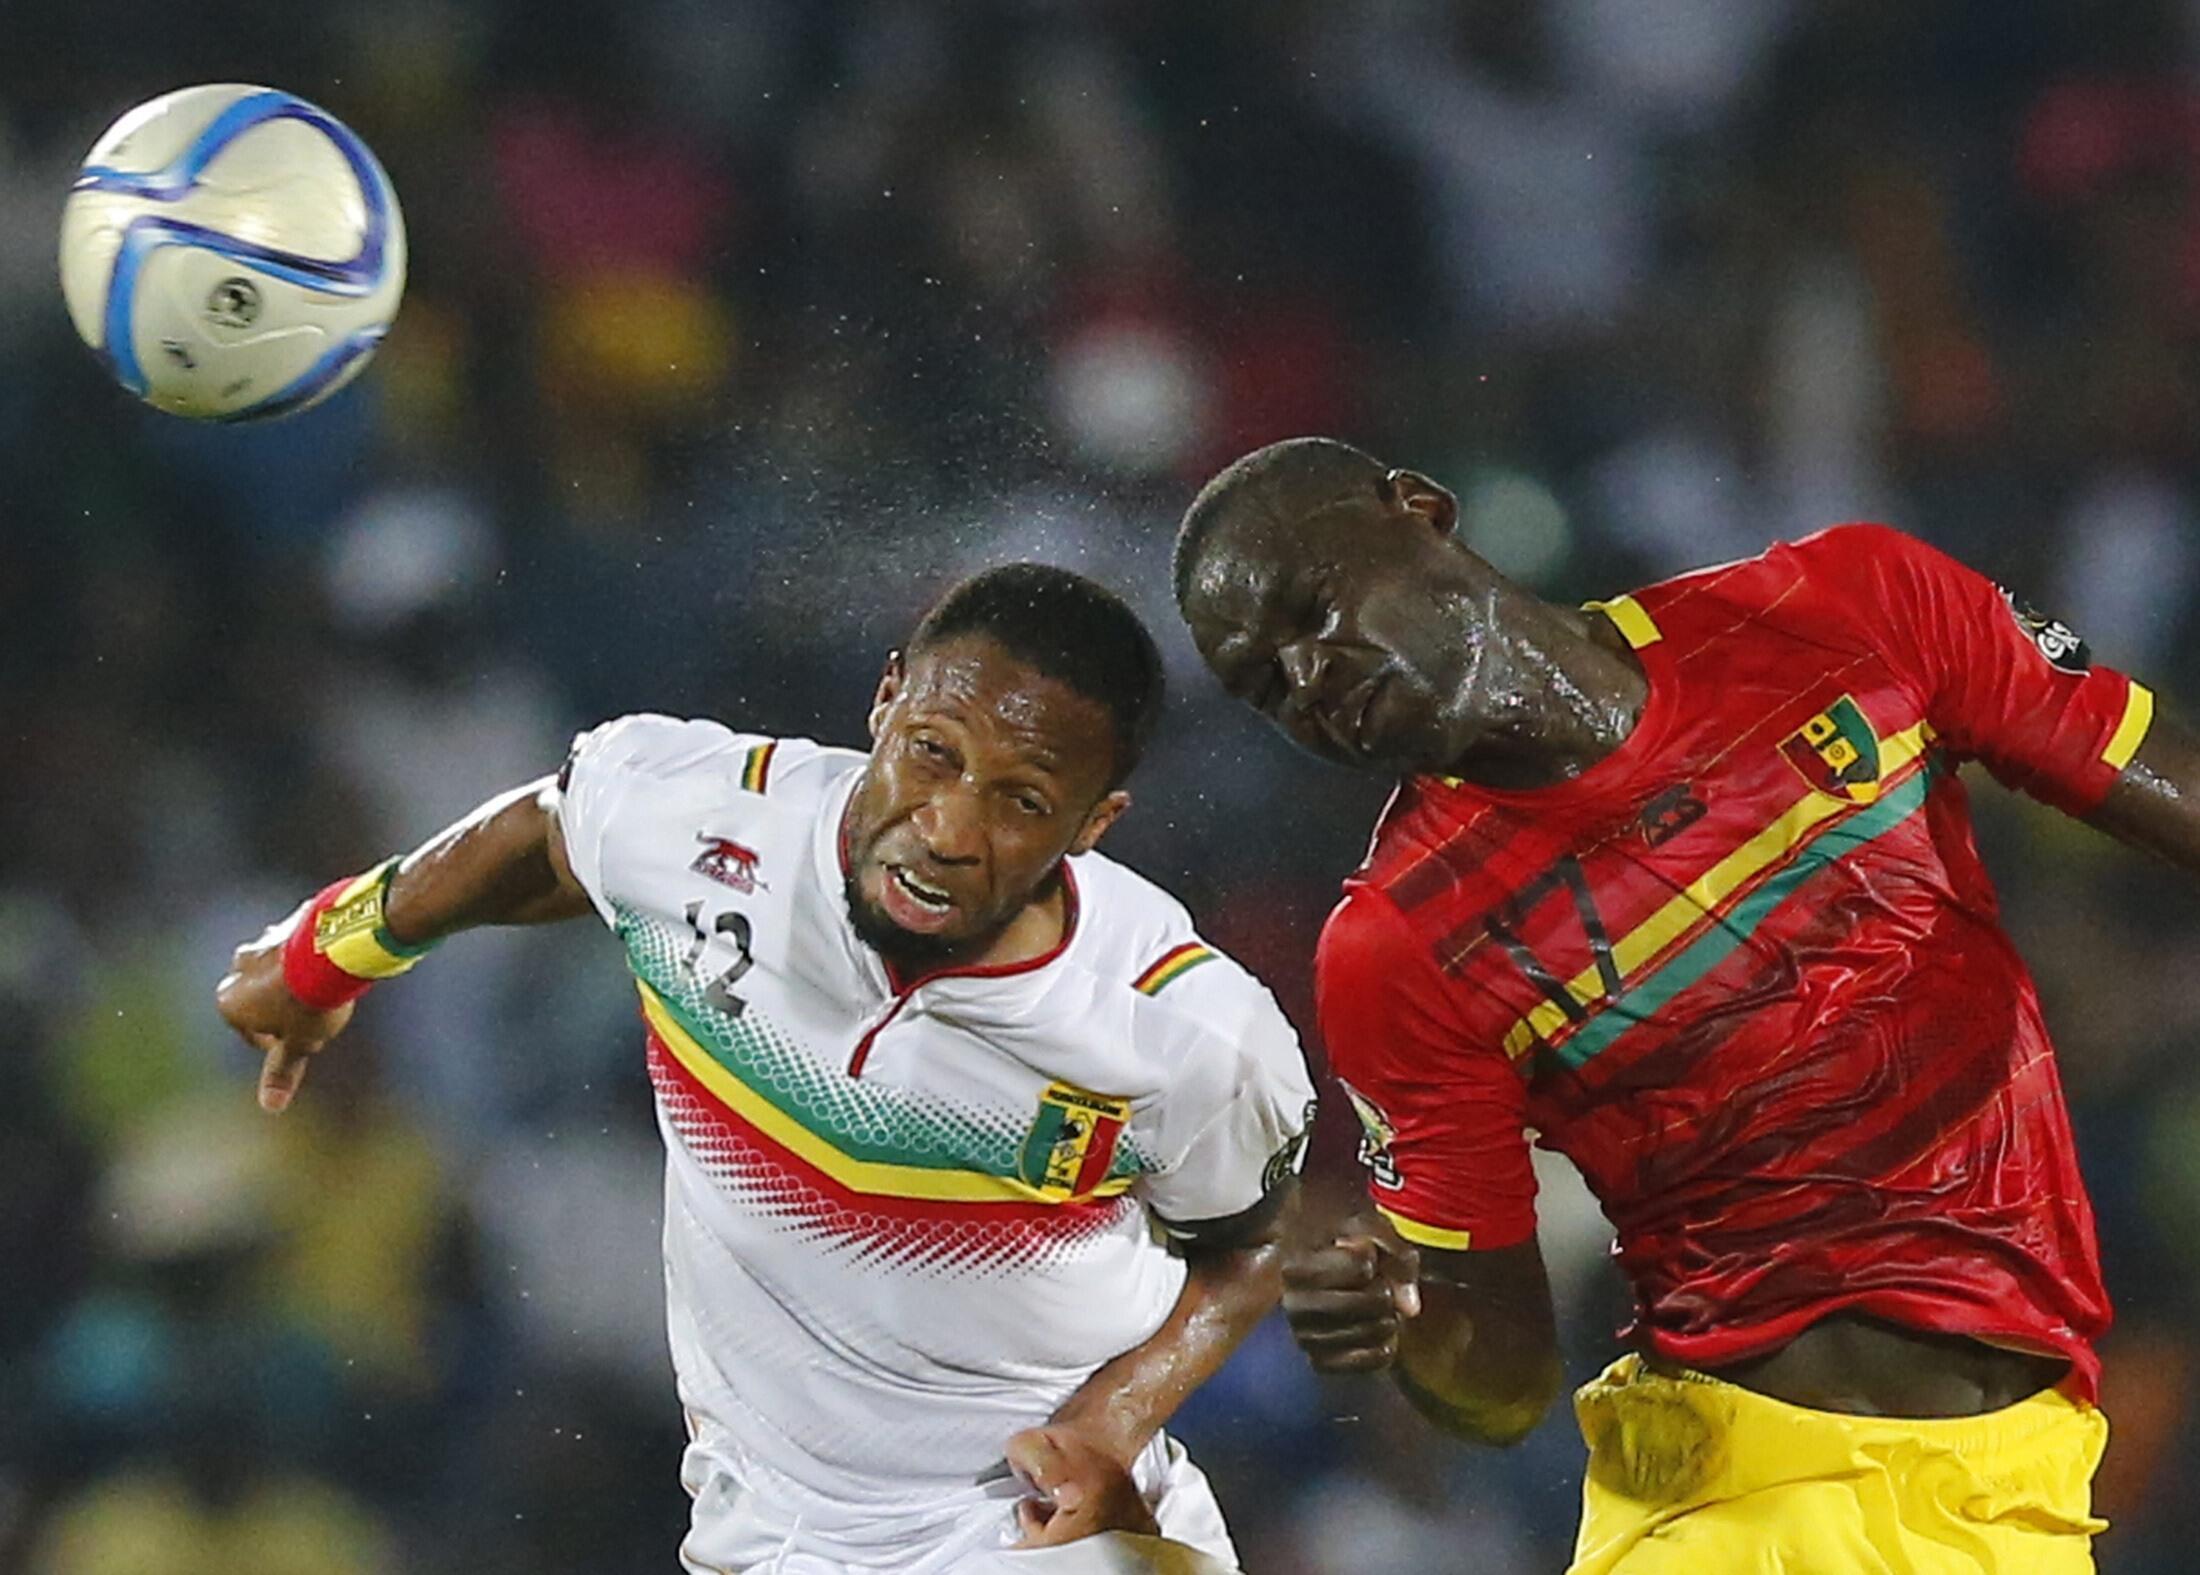 Guinea's Boubacar Fofana (R) with Mali's Seydou Keita at this year's CAN